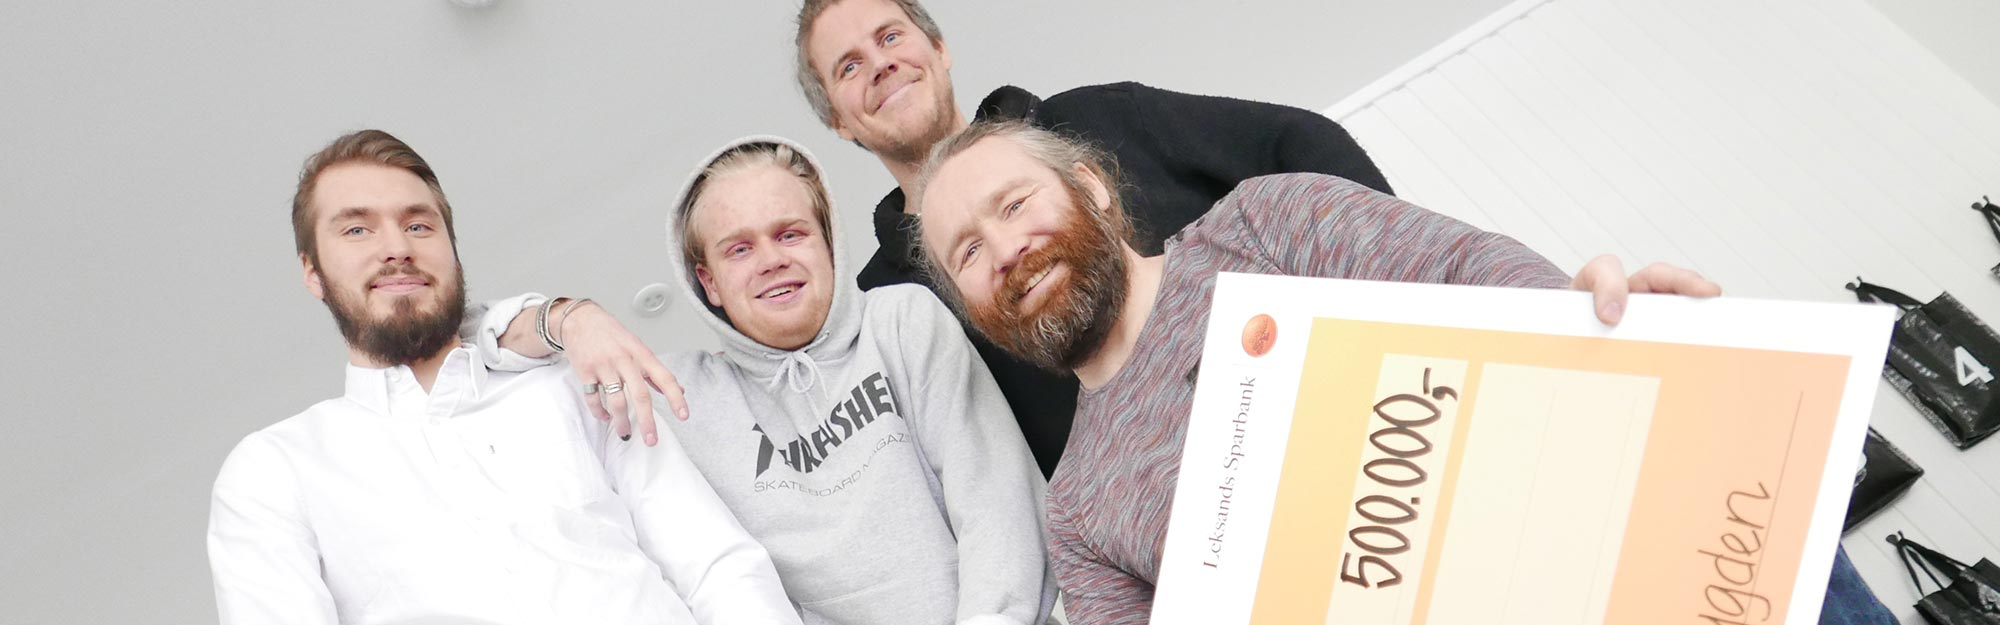 ppen verksamhet i Jrflla   satisfaction-survey.net